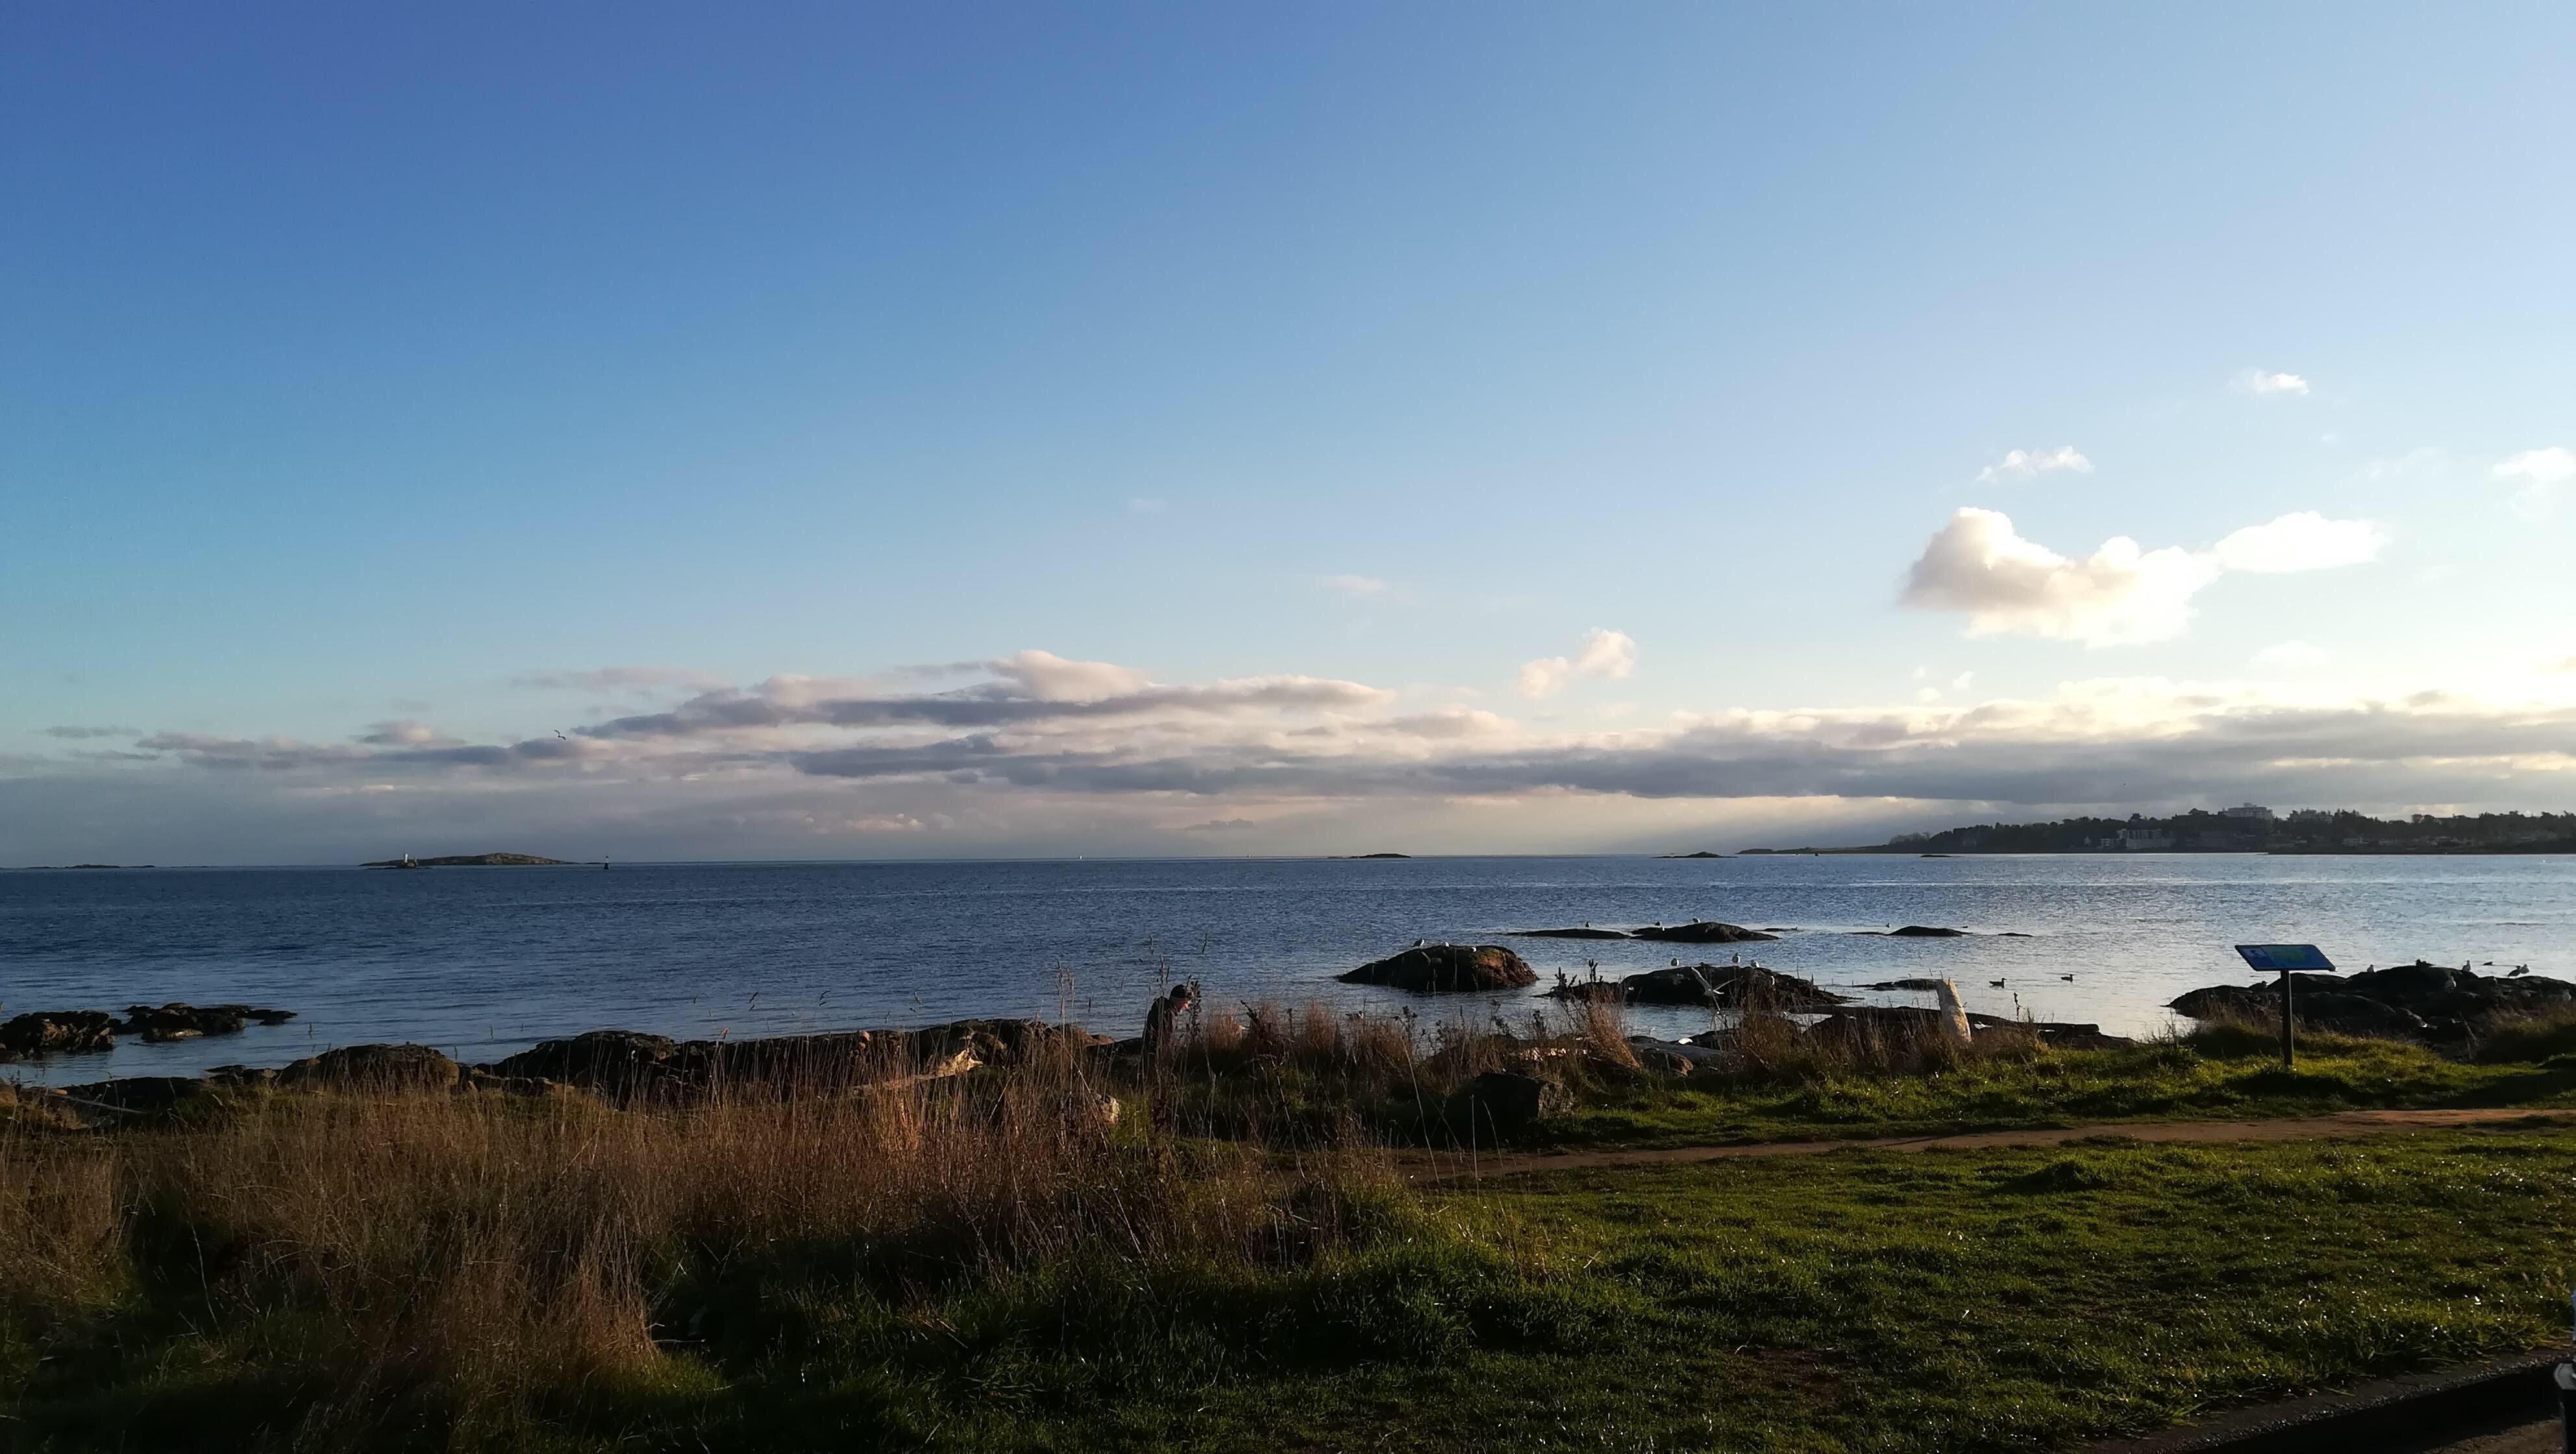 Clover Point